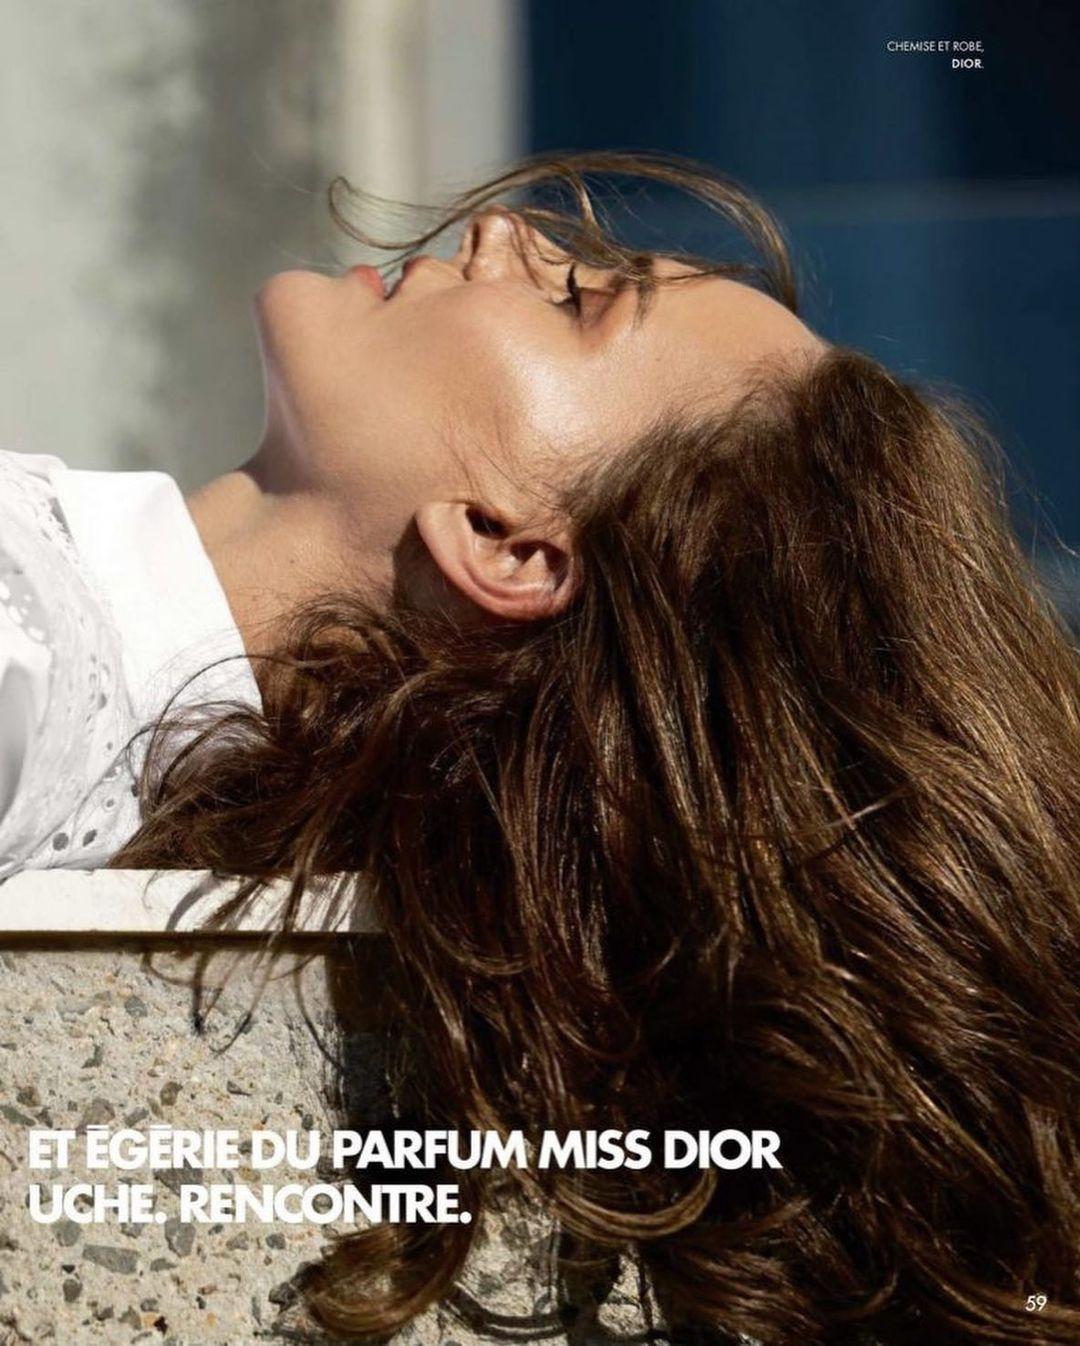 Натали Портман украсила обложку известного глянца (ФОТО) - фото №2